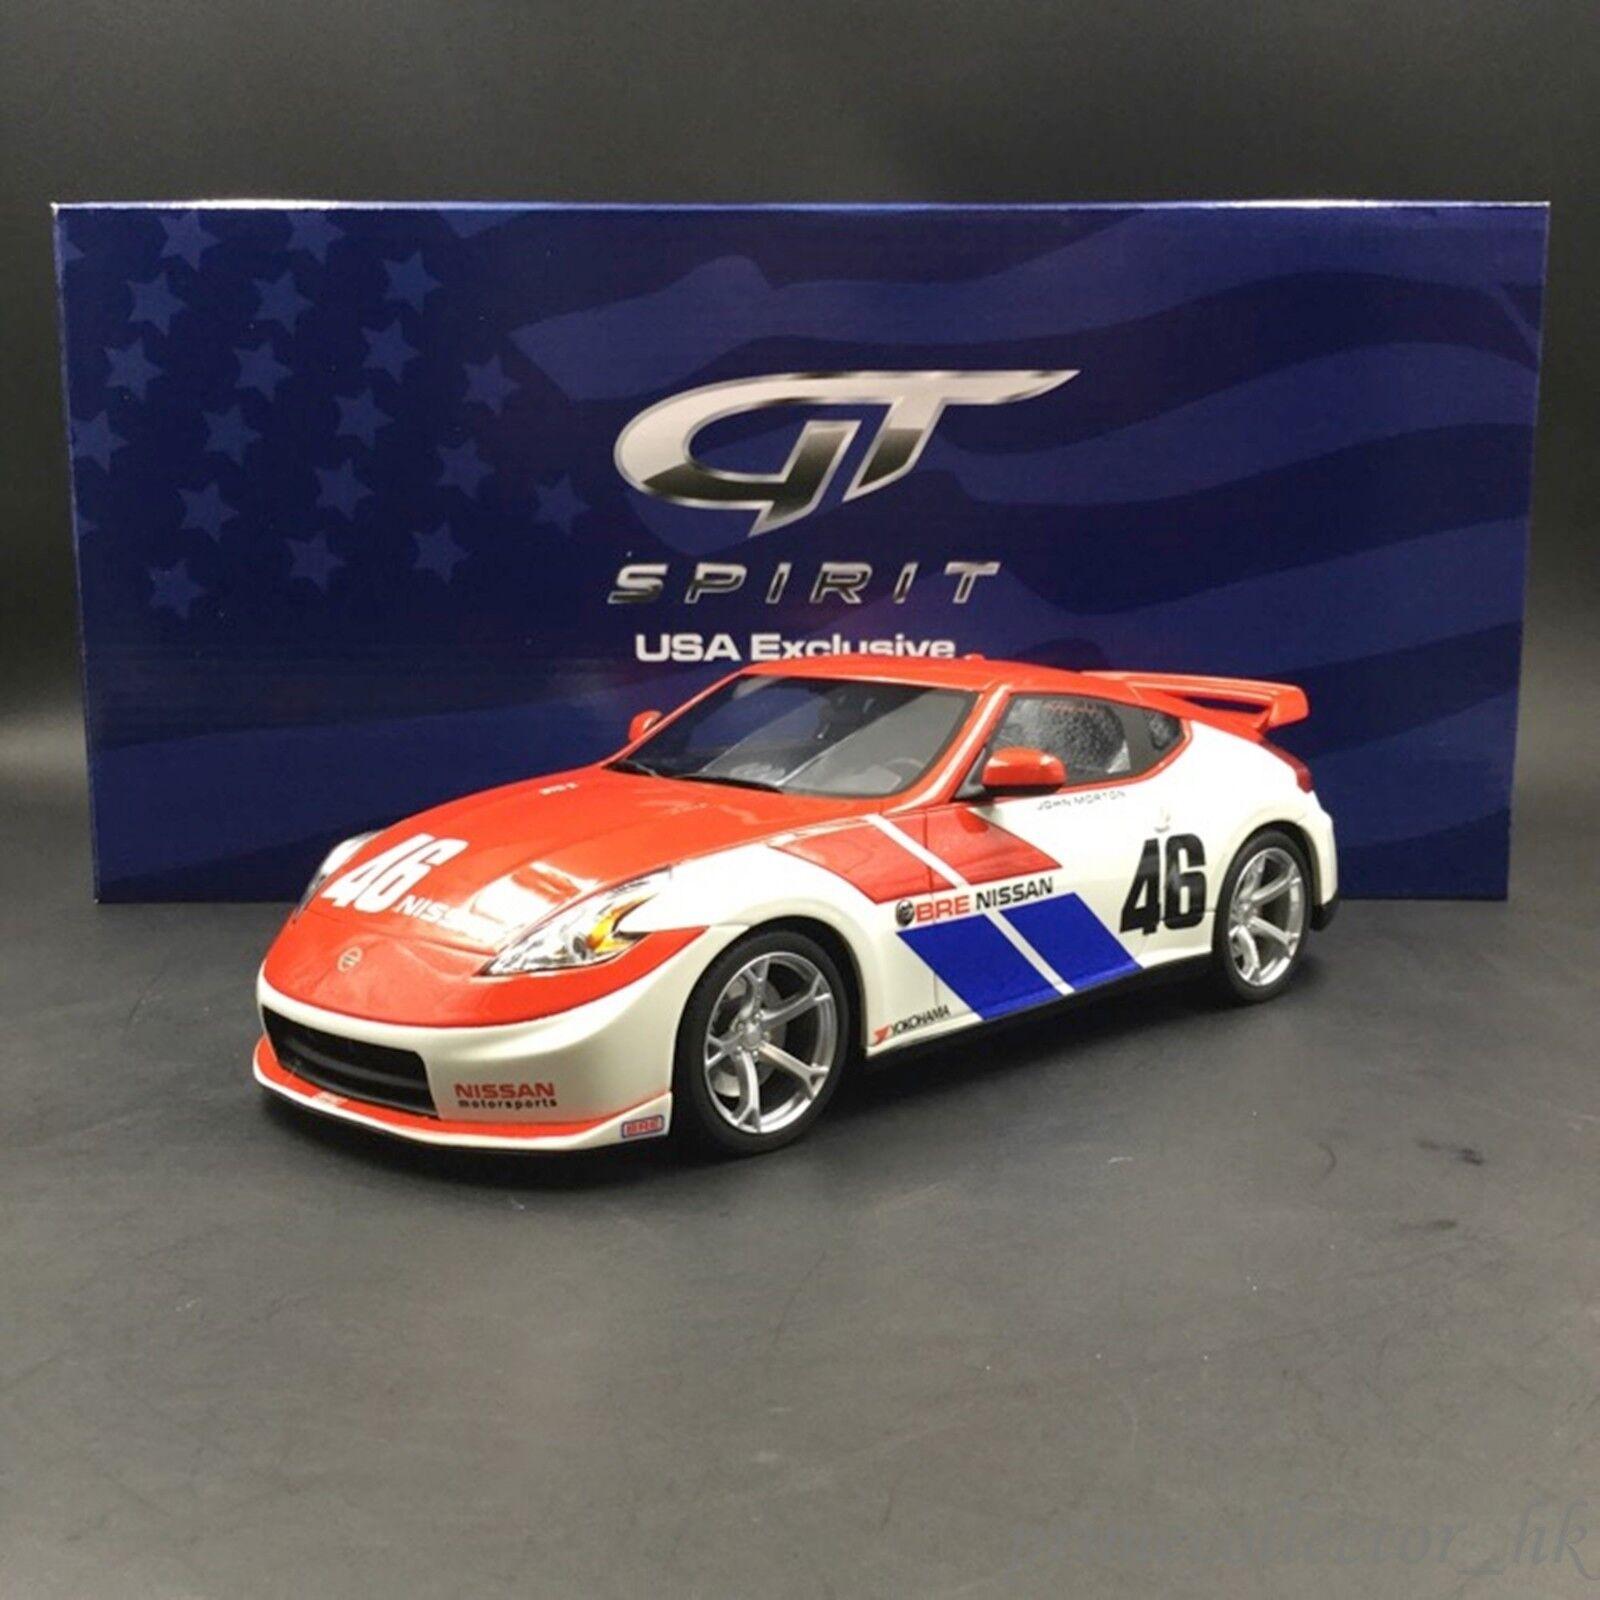 GT Spirit 1/18 2018 Nissan 370Z US013 aniversario 40